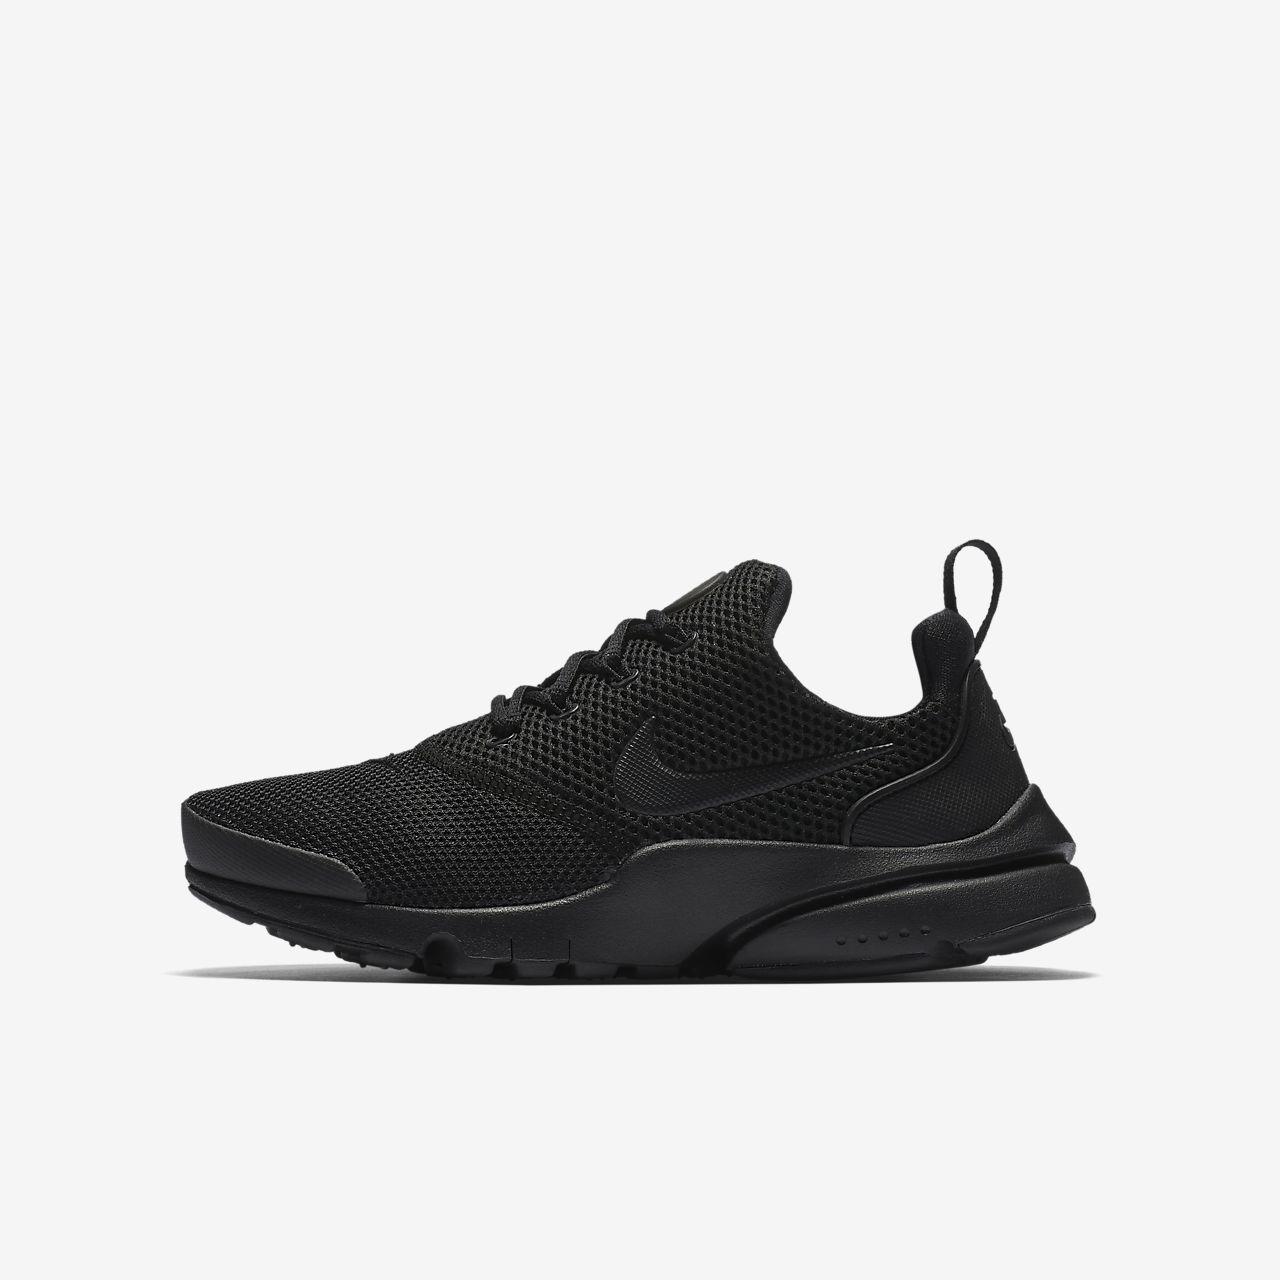 ... Nike Presto Fly Big Kids' Shoe